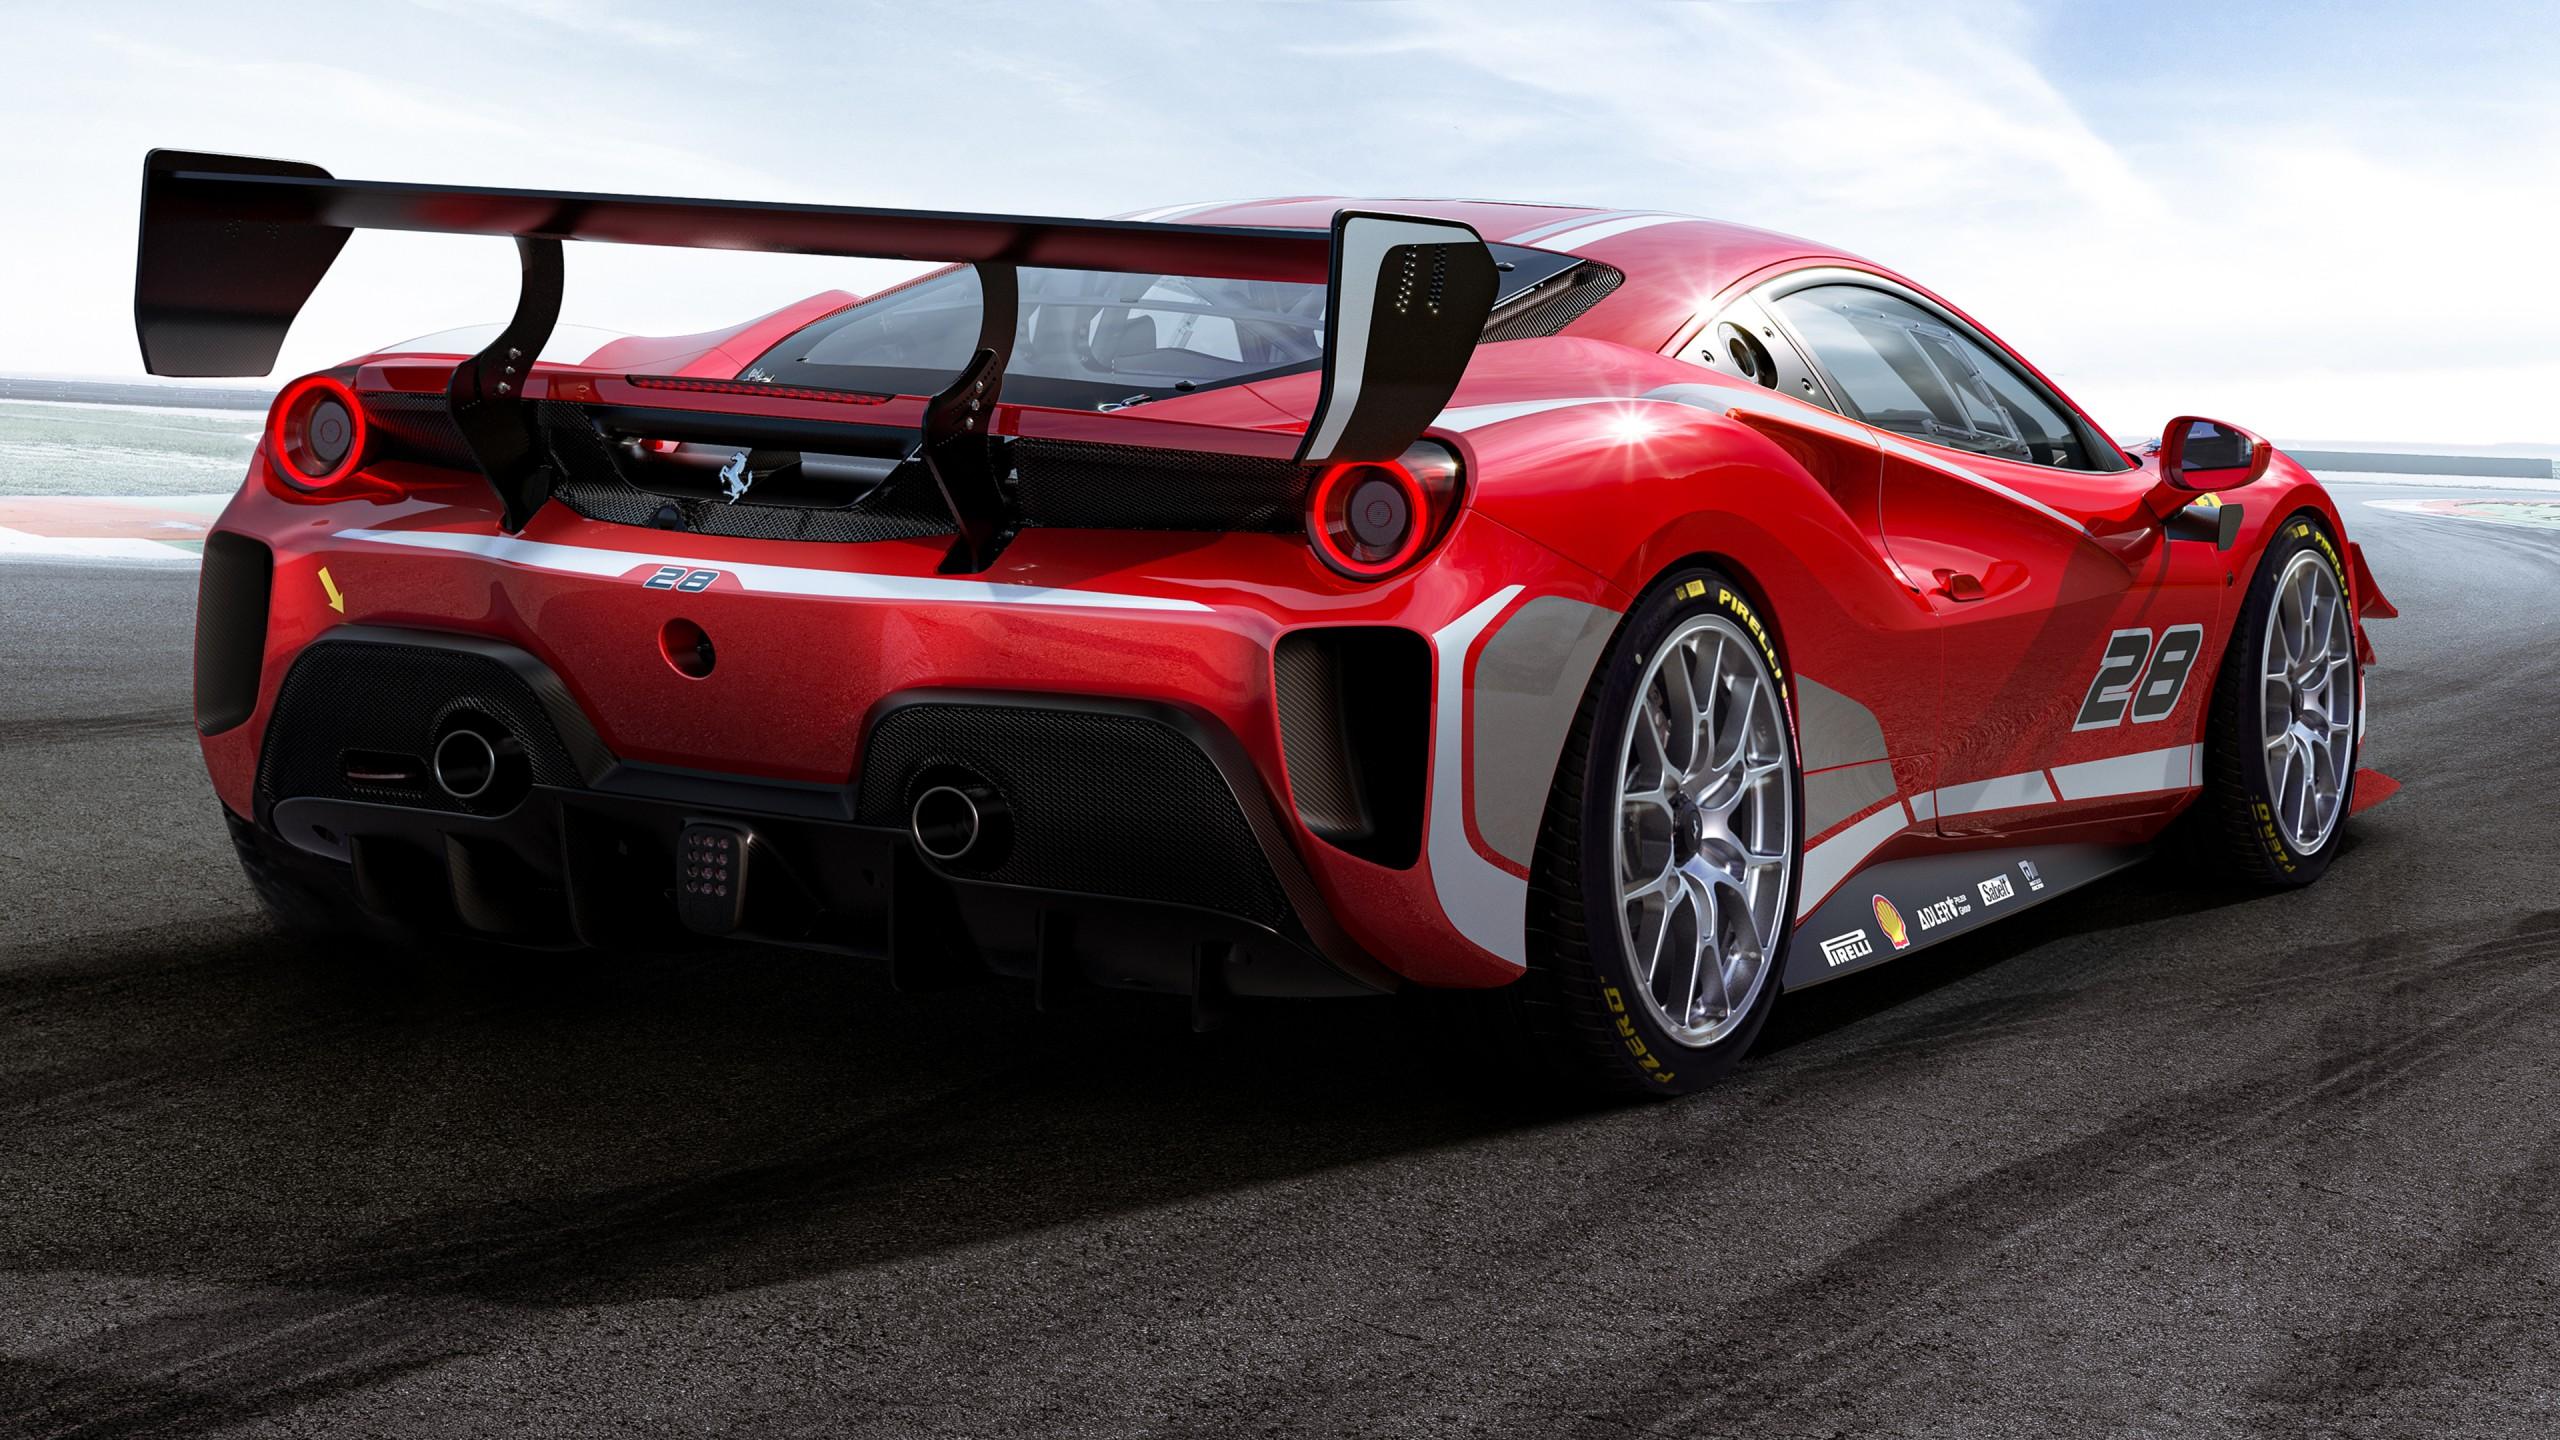 Ferrari 488 Challenge Evo 2020 4K Wallpaper HD Car Wallpapers 2560x1440